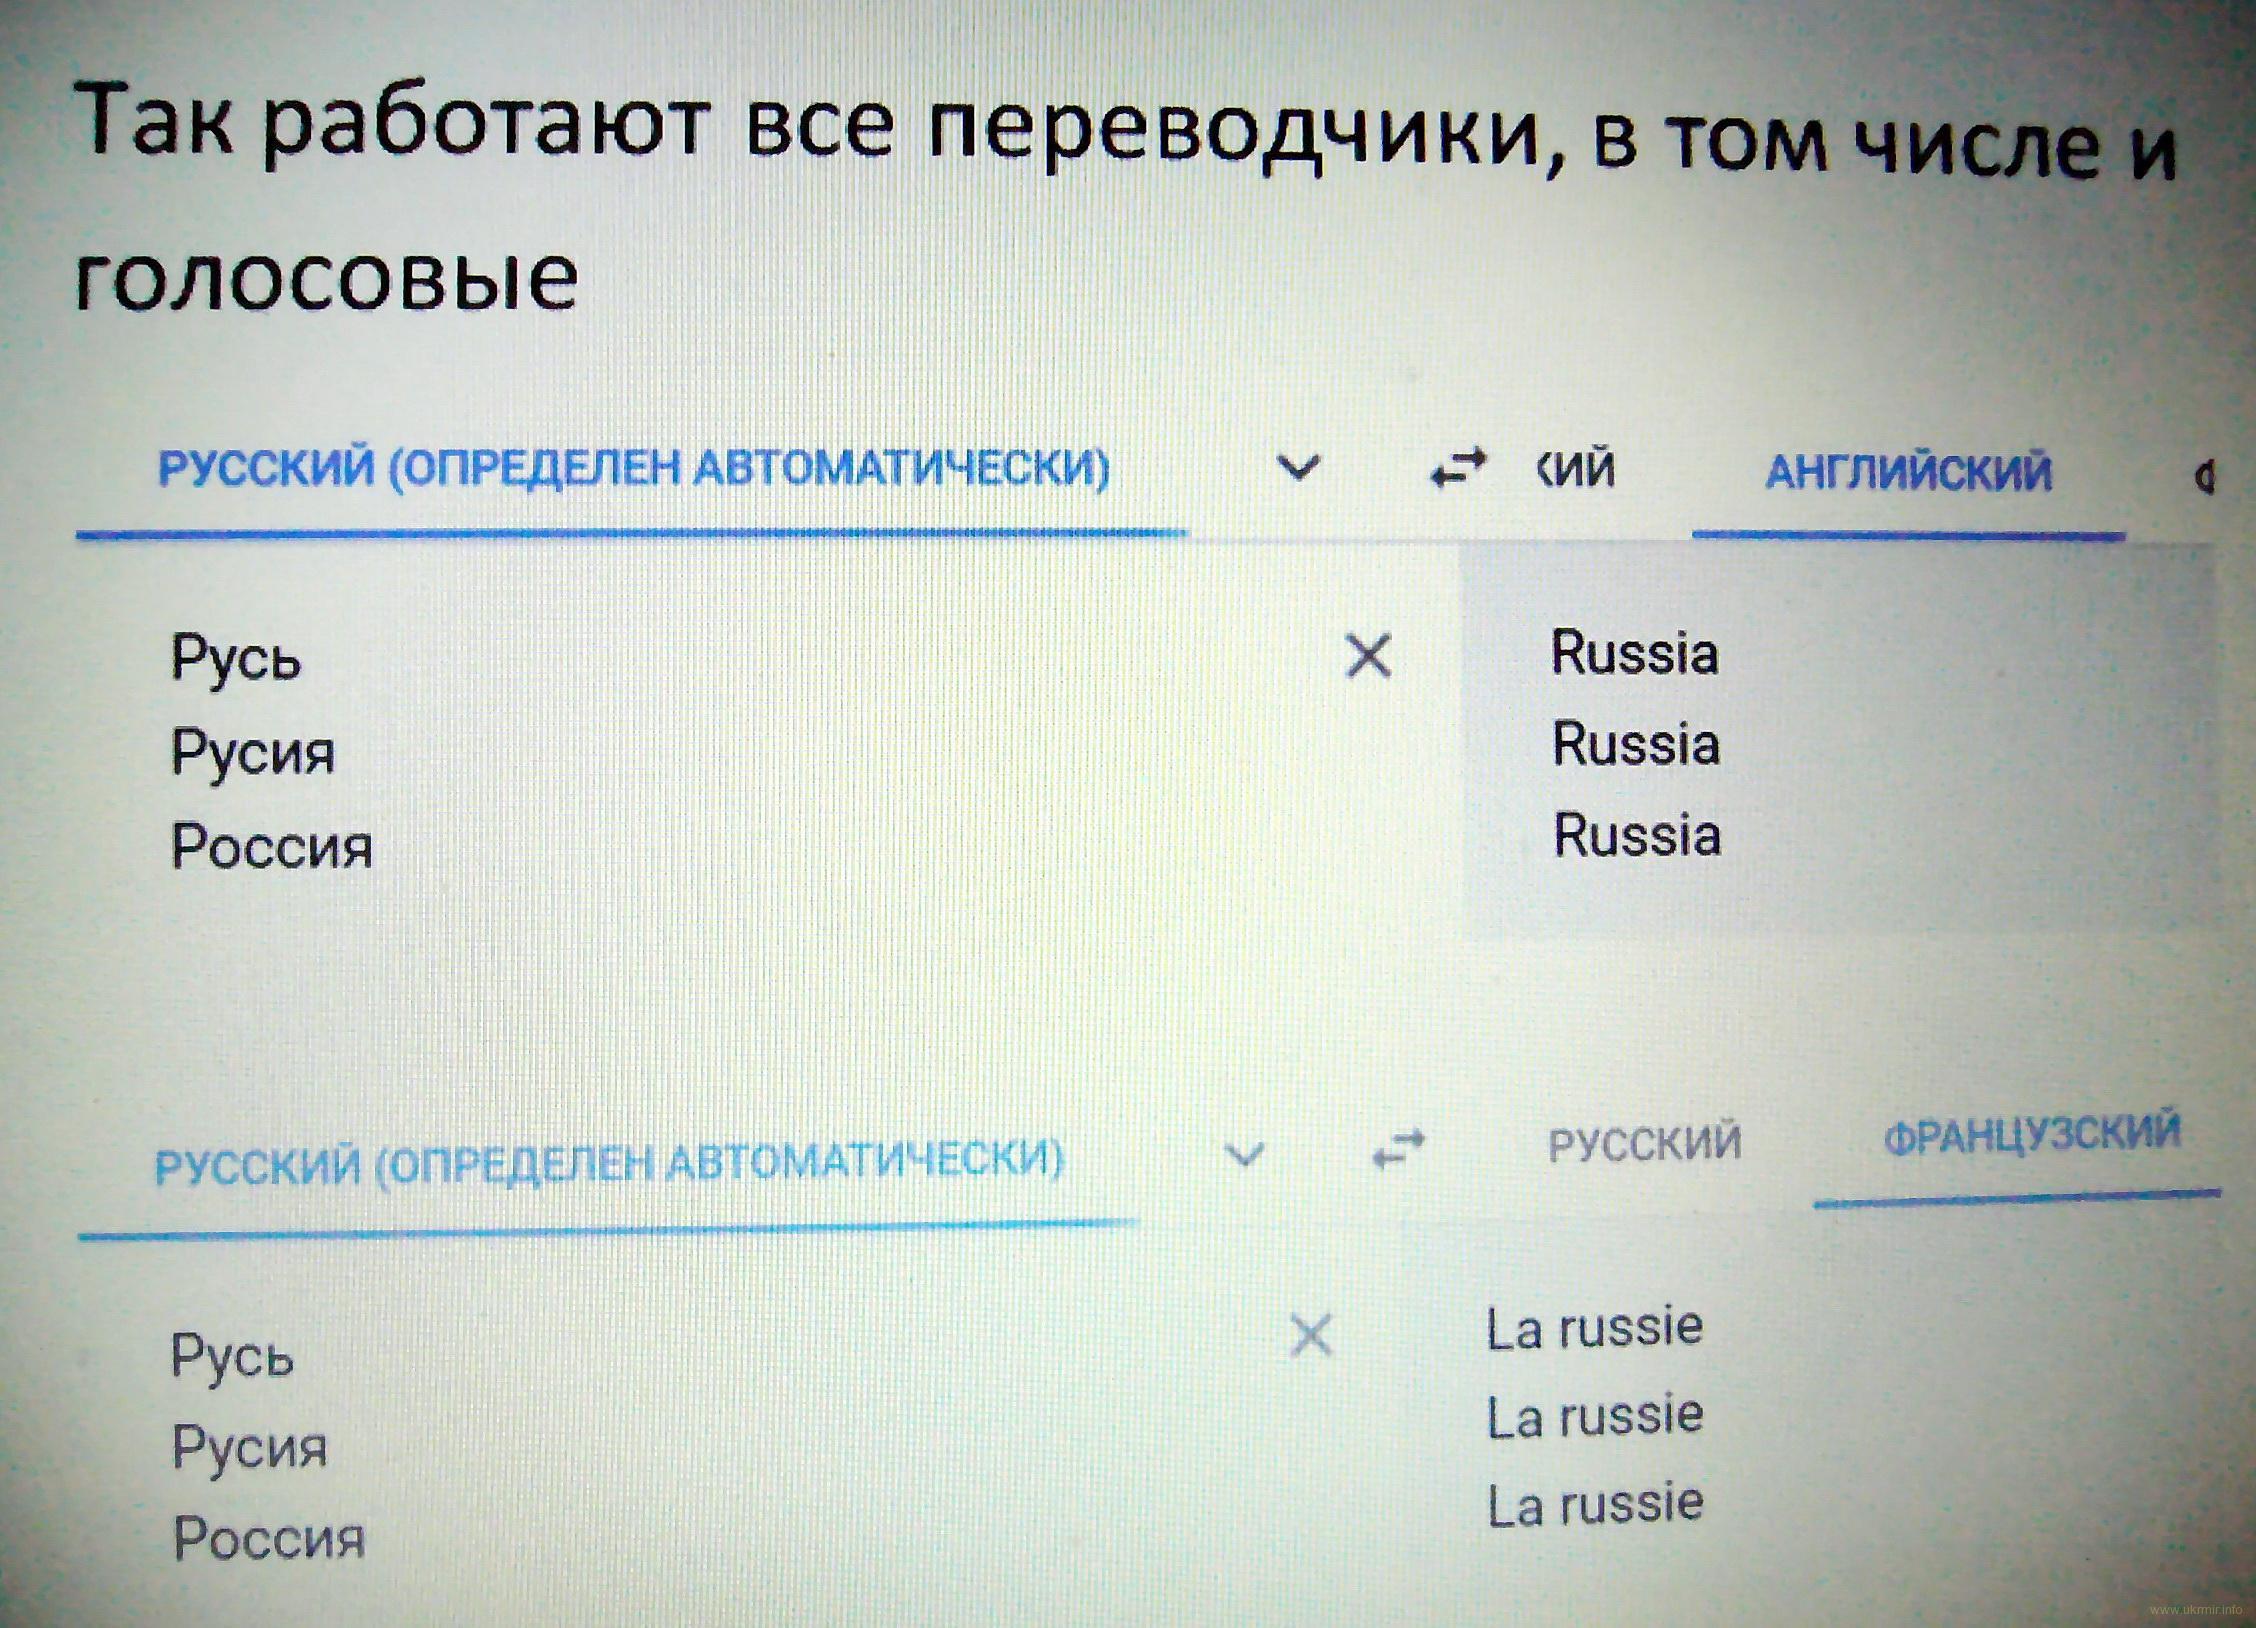 Перевод Руси стал идентичен России.